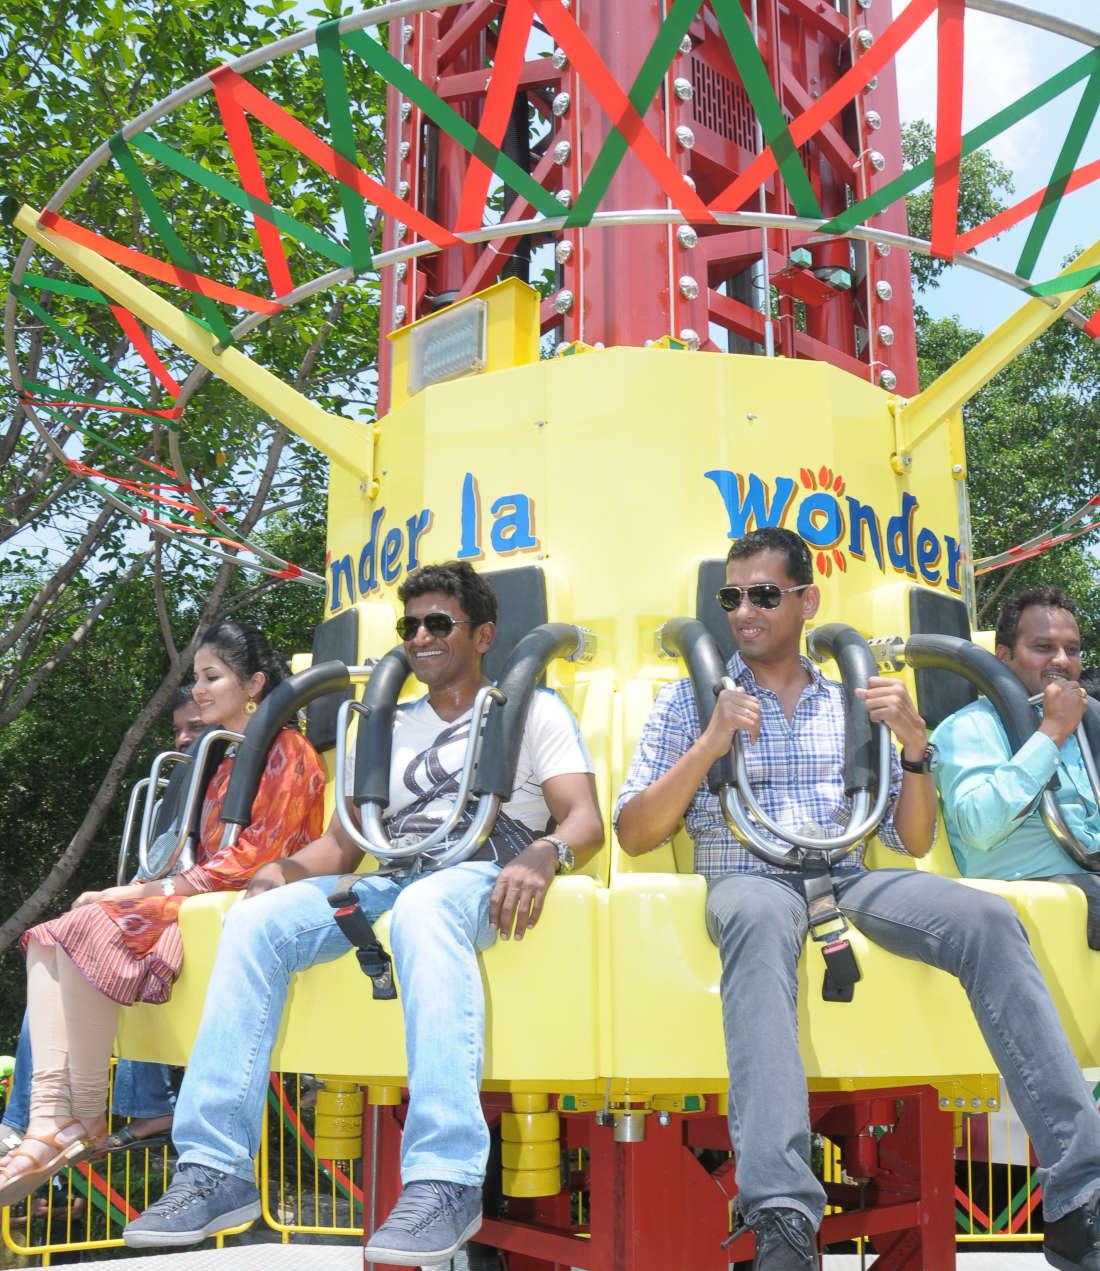 Wonderla Amusement Parks & Resort  Ride inauguration image